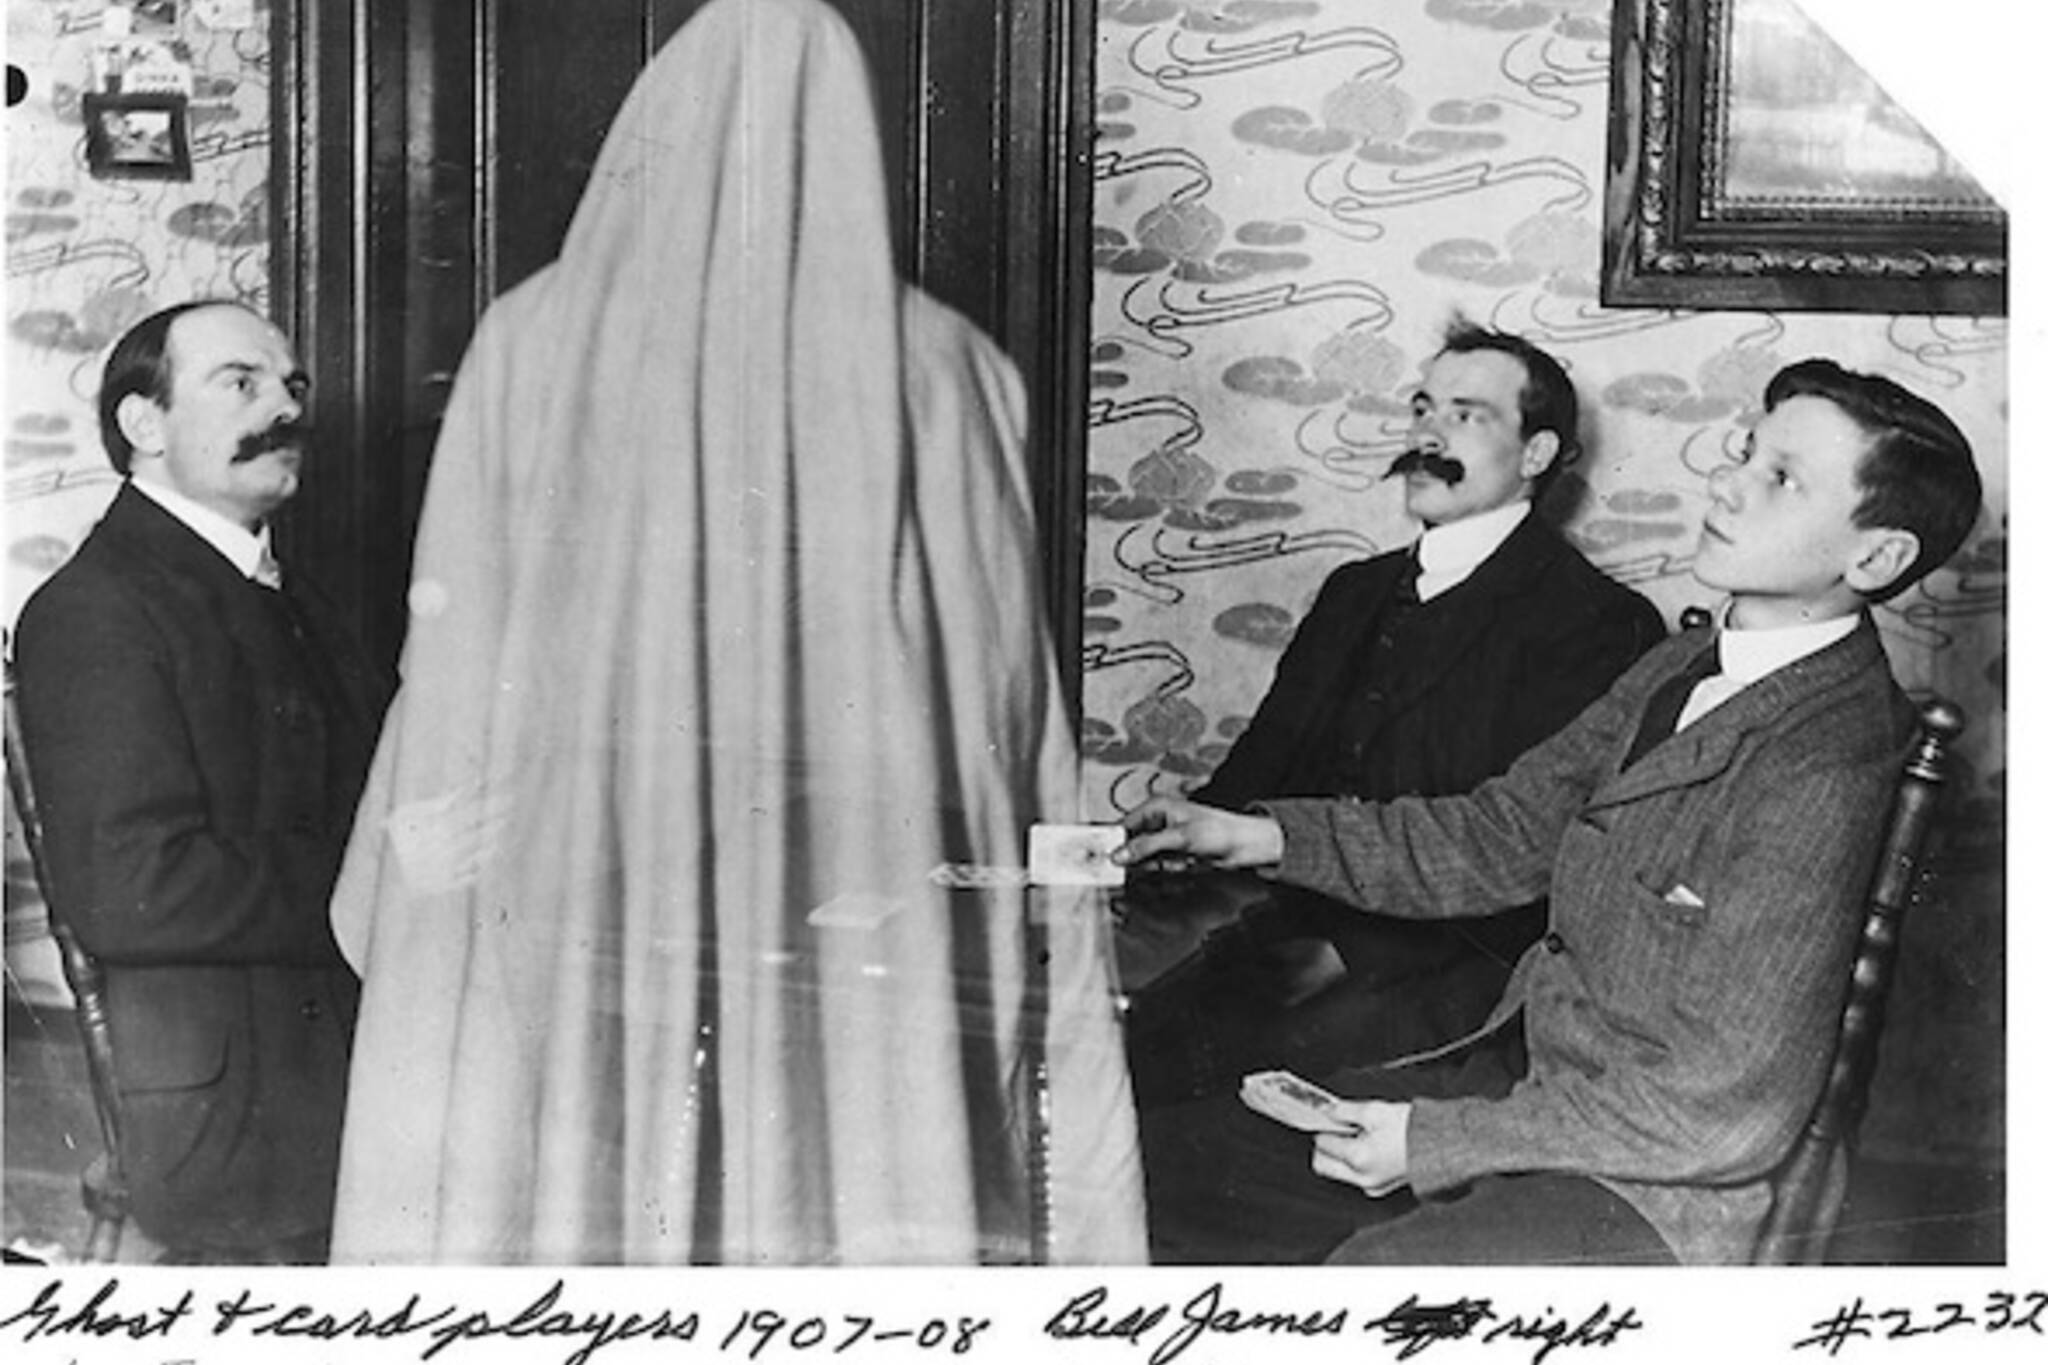 Toronto Ghost Caption William James